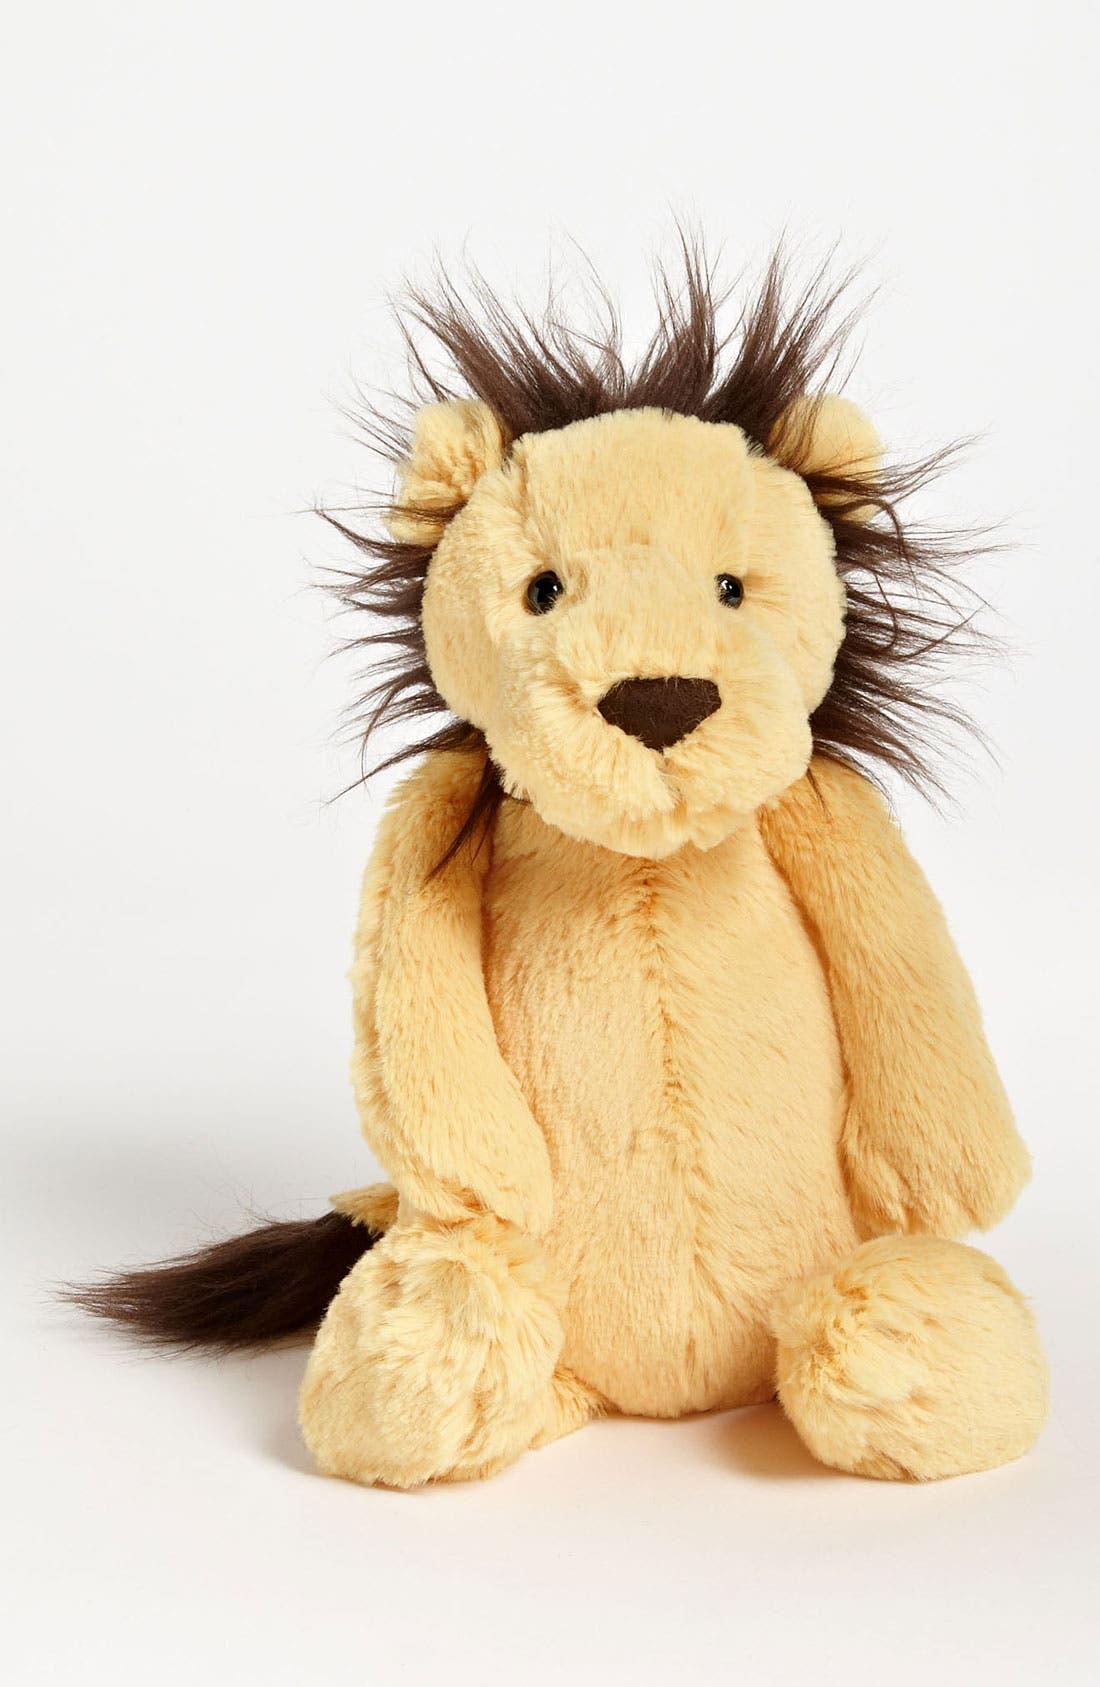 Alternate Image 1 Selected - Jellycat 'Bashful Lion' Stuffed Animal